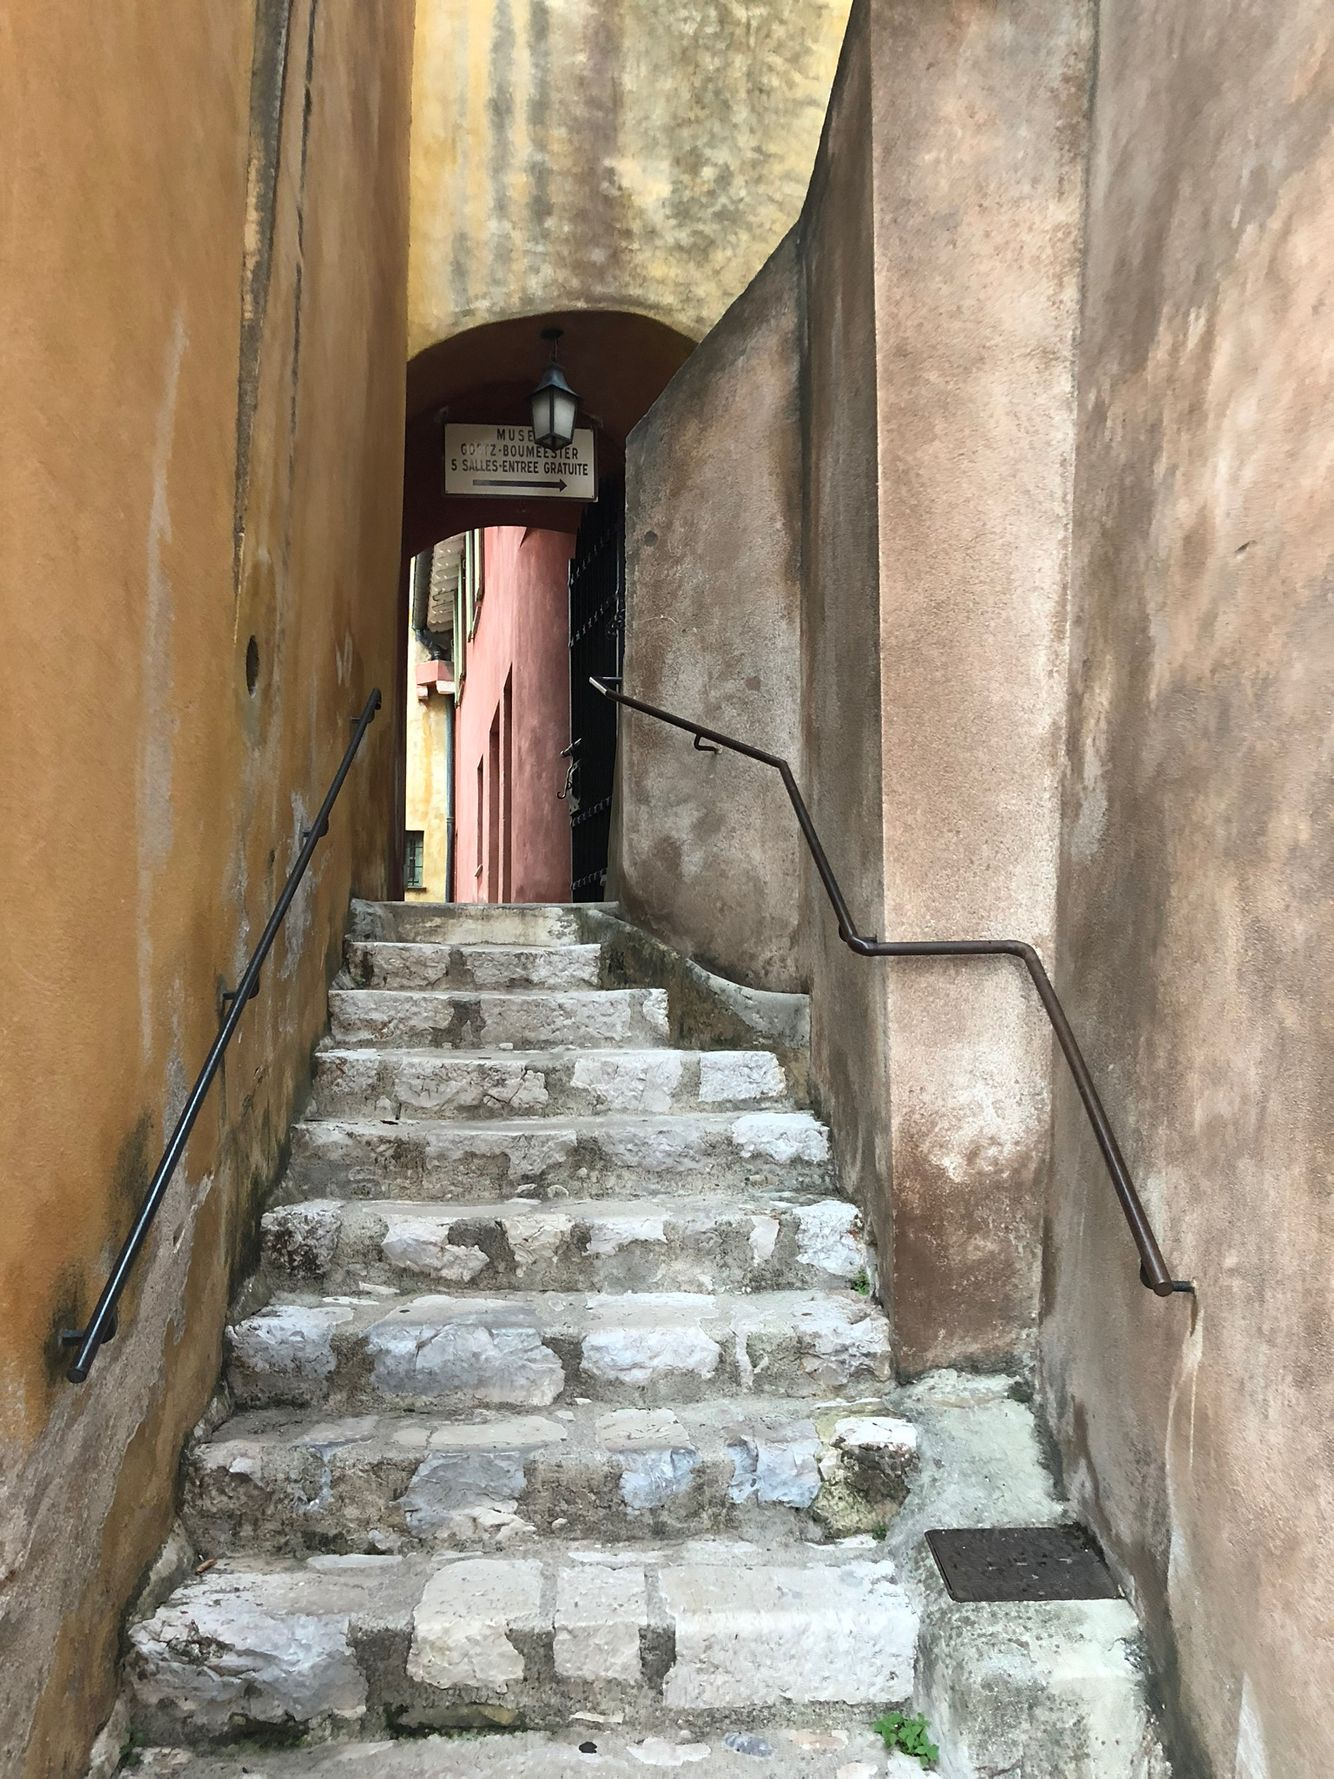 Painterly alley in Villefranche-sur-Mer